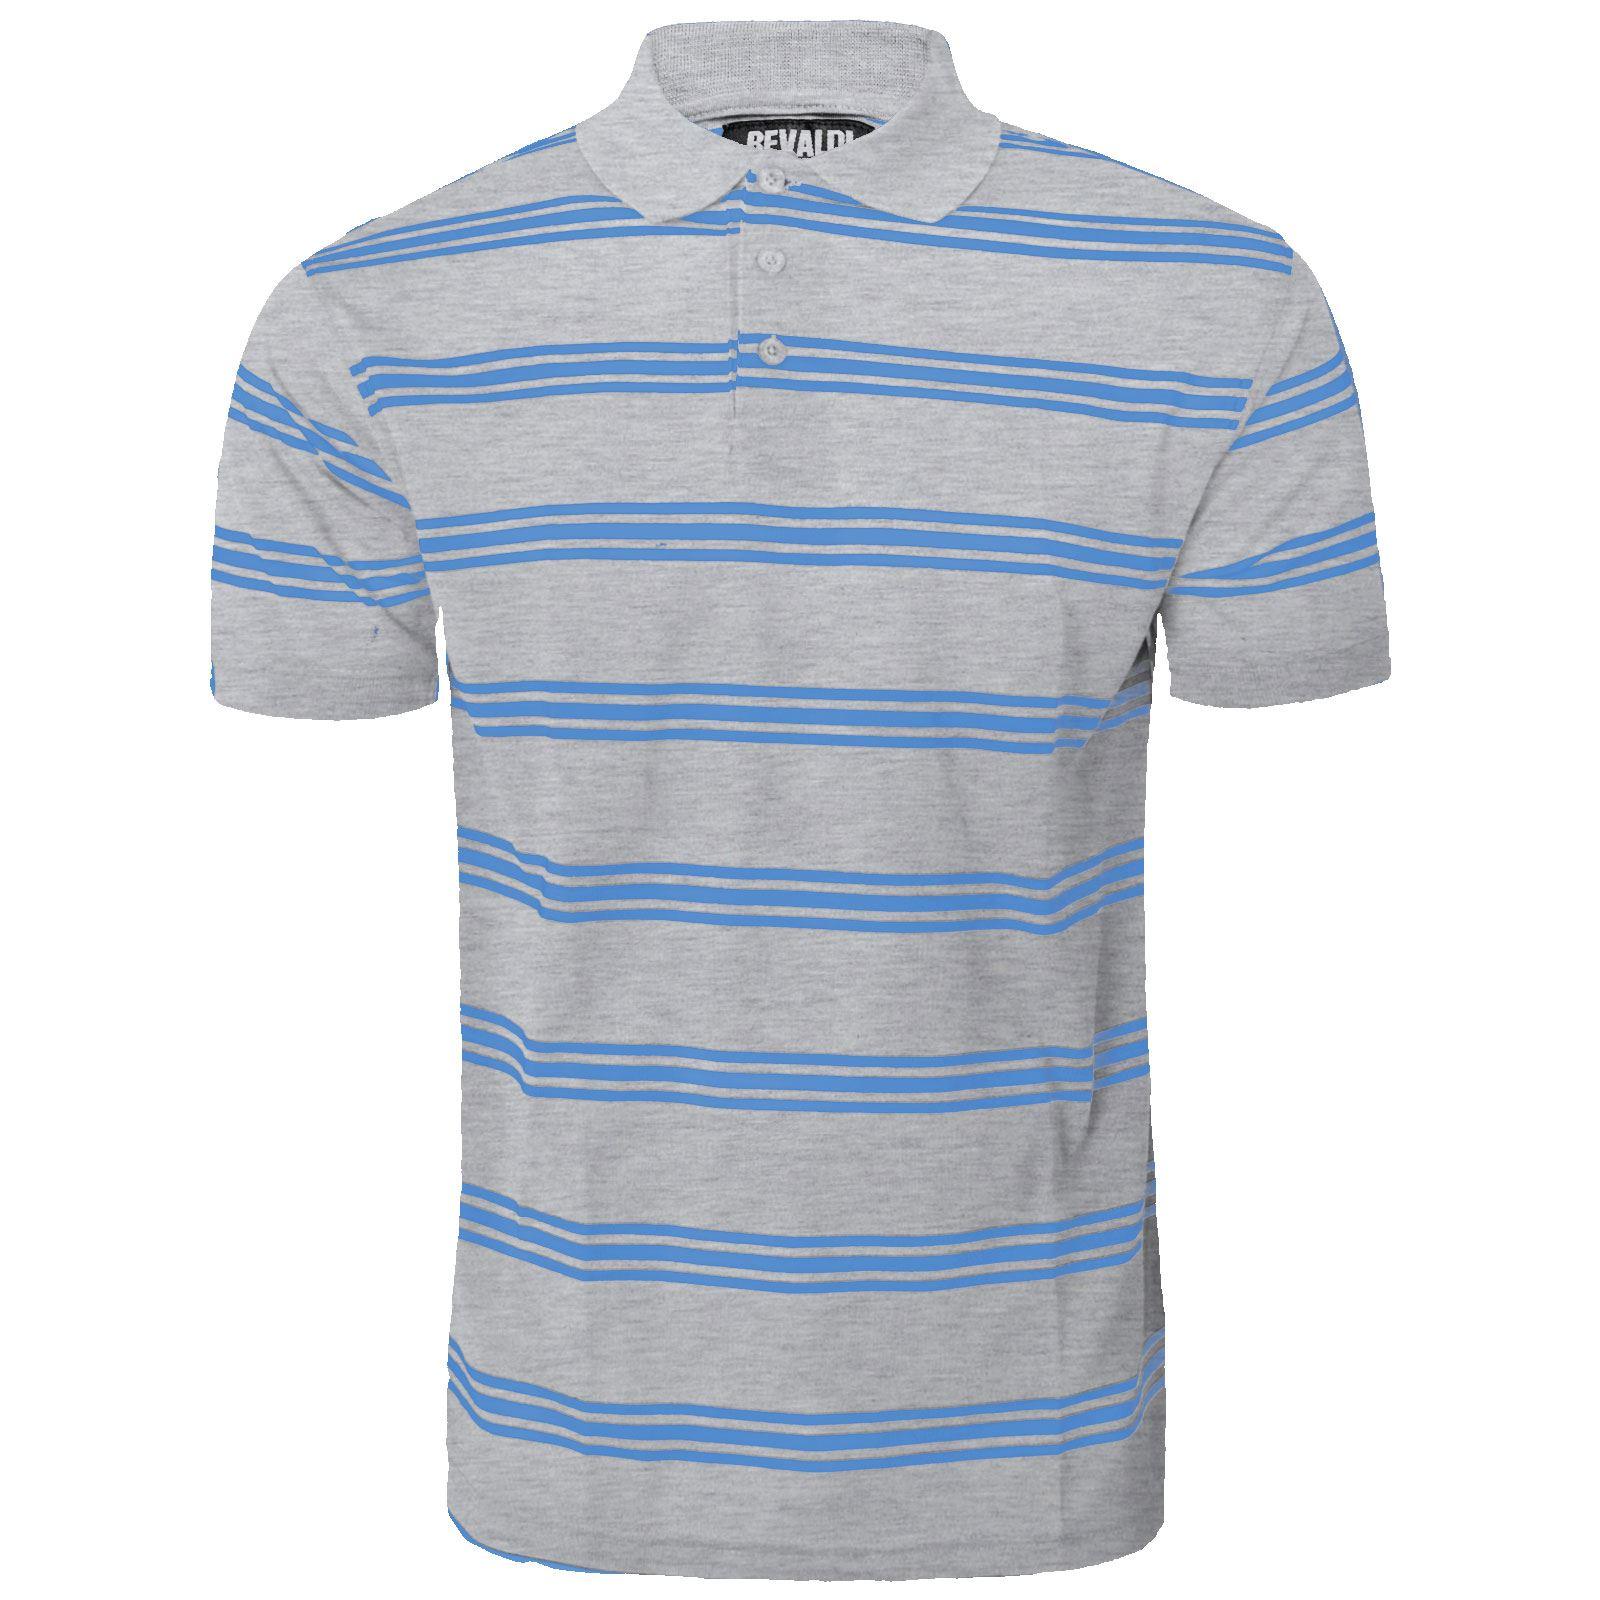 Mens Striped Polo Shirt Short Sleeve Top Button T Shirt